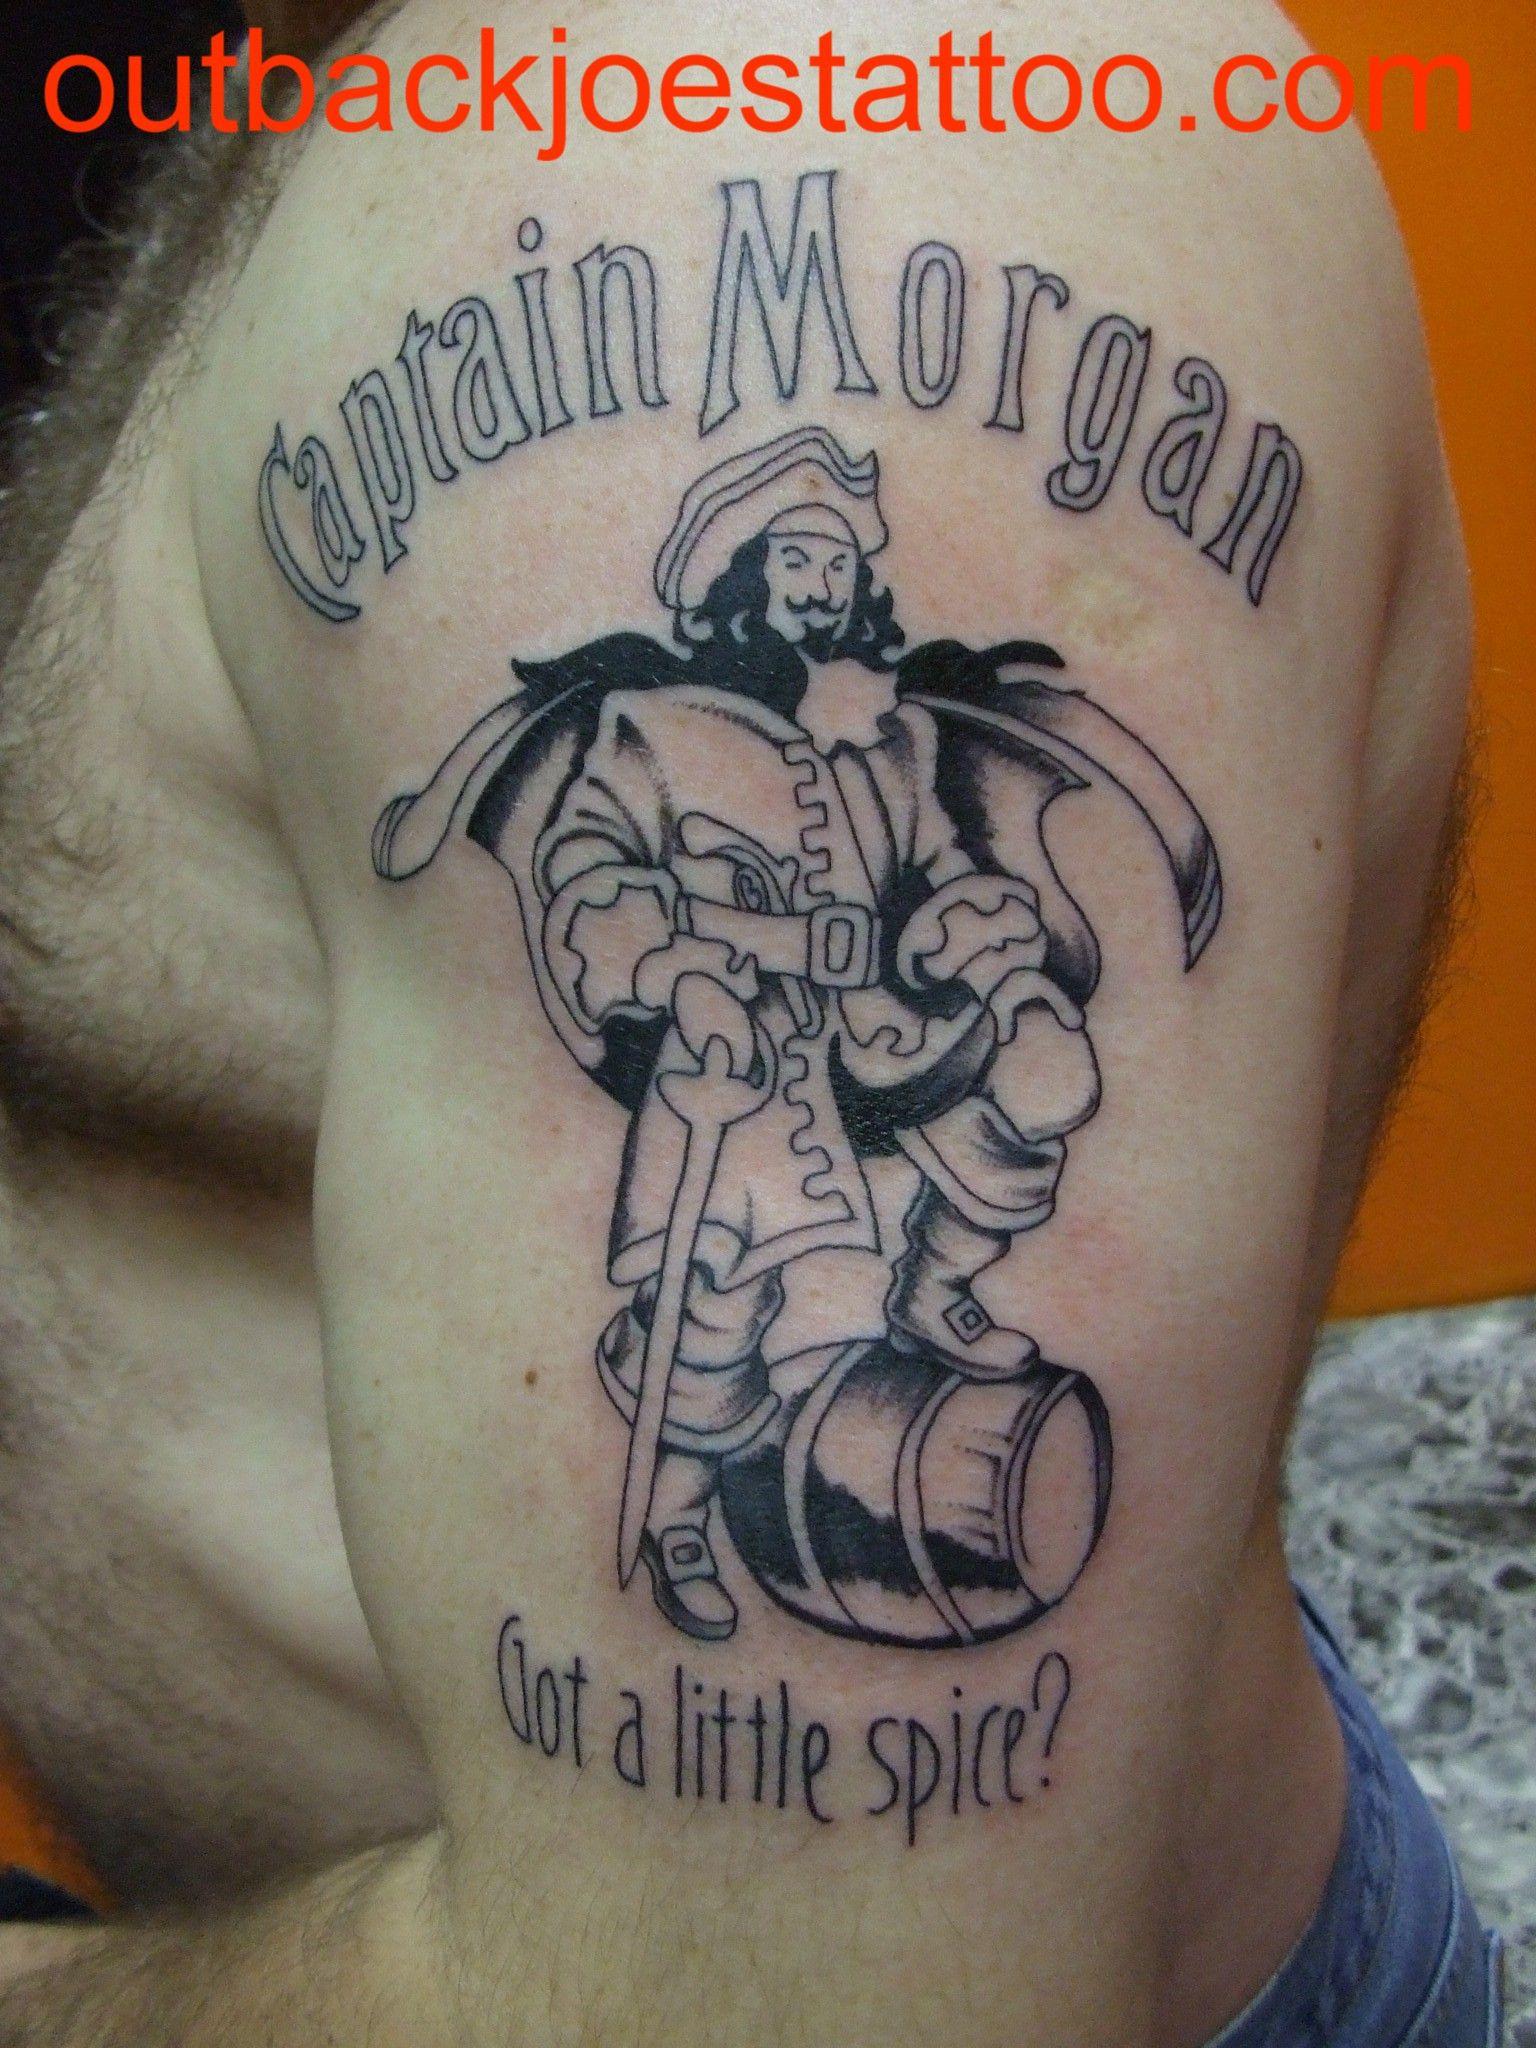 captain morgan tattoo - HD1536×2048